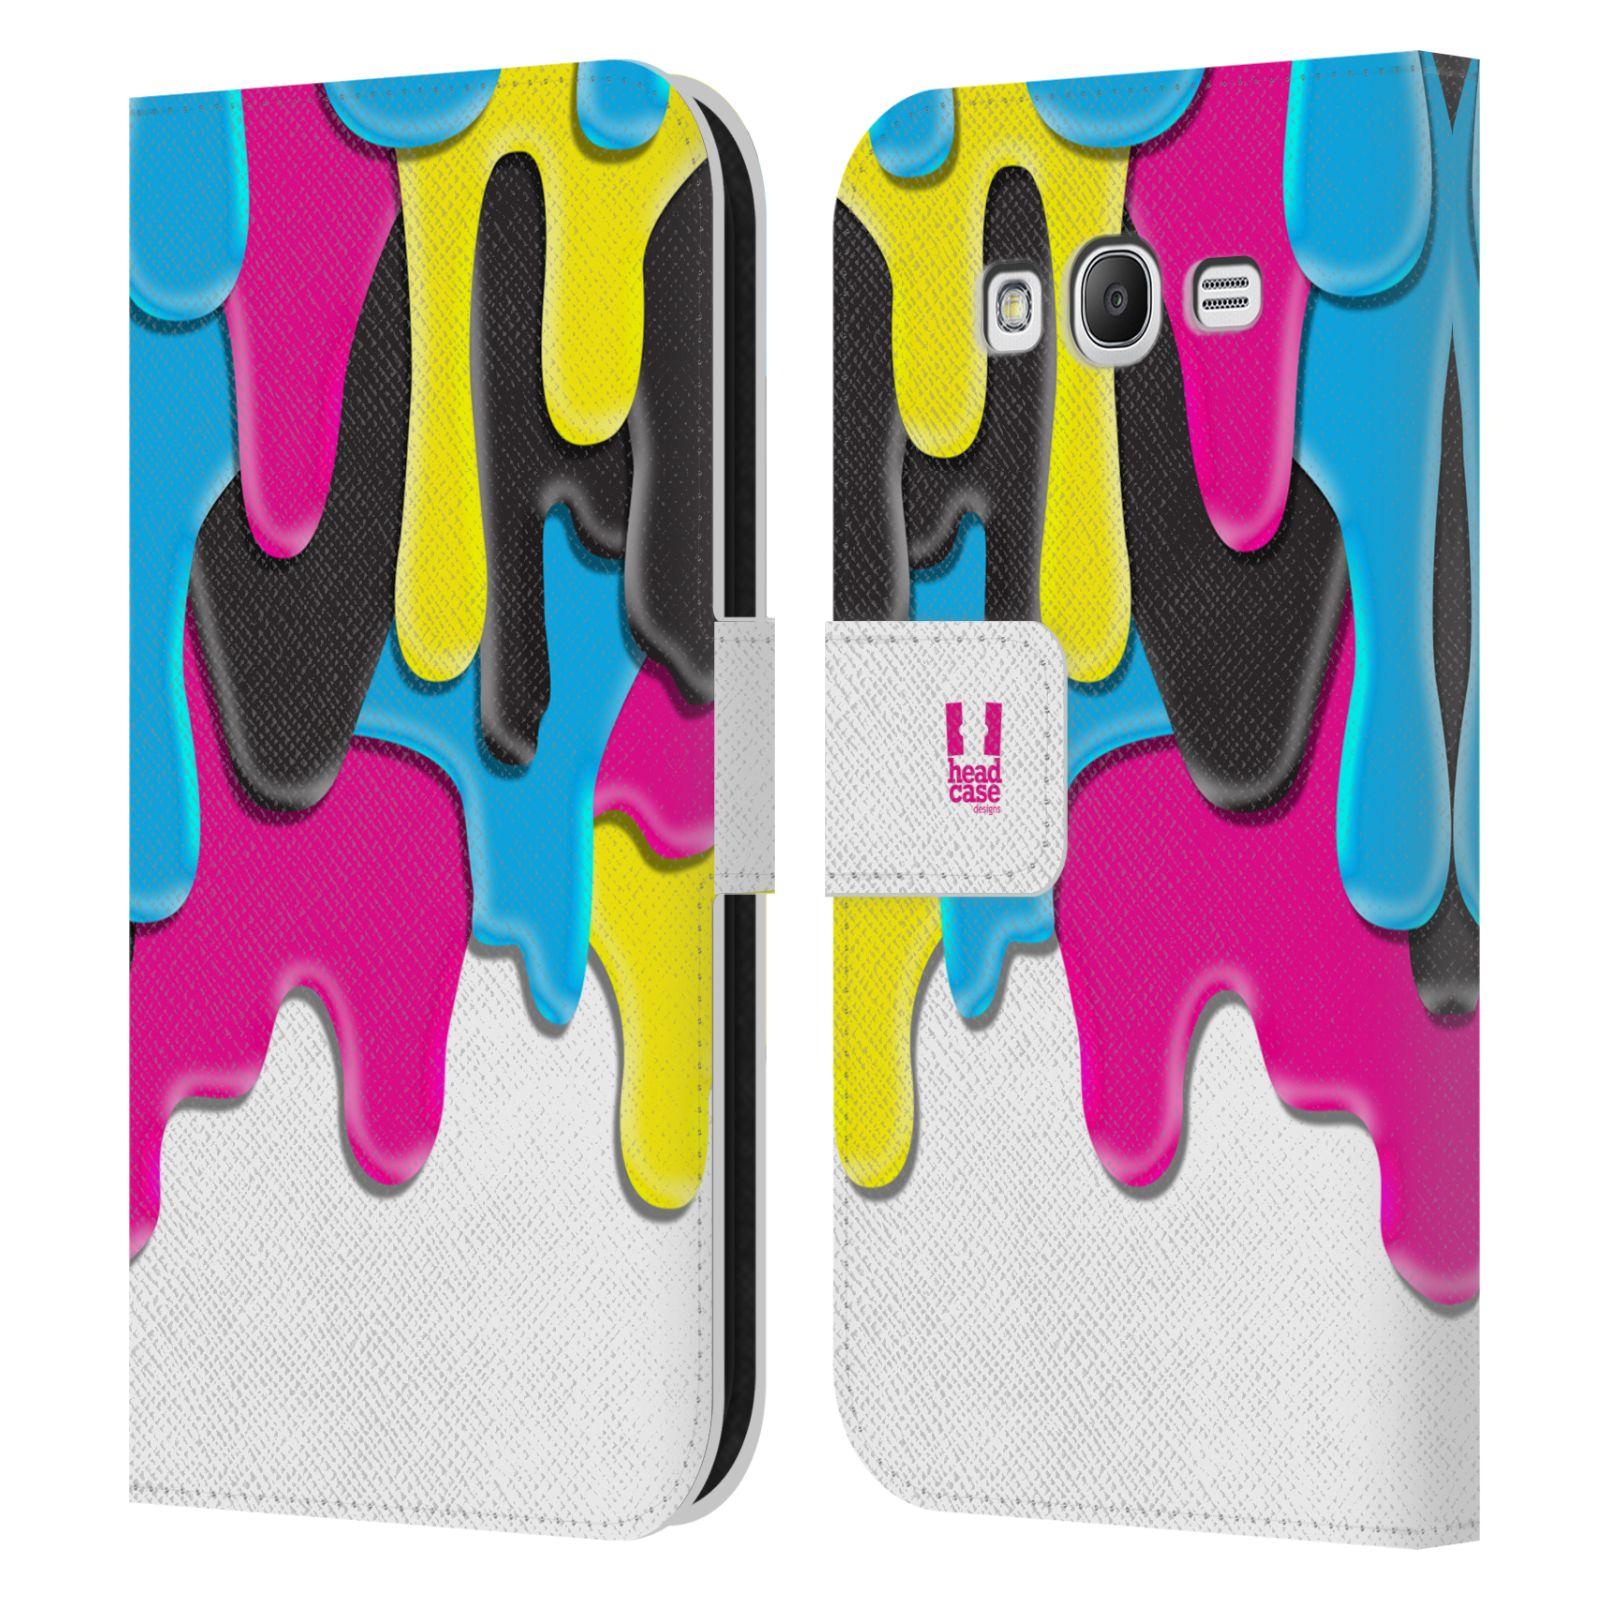 HEAD CASE Flipové pouzdro pro mobil Samsung Galaxy Grand i9080 ZÁPLAVA BARVA MIX barev